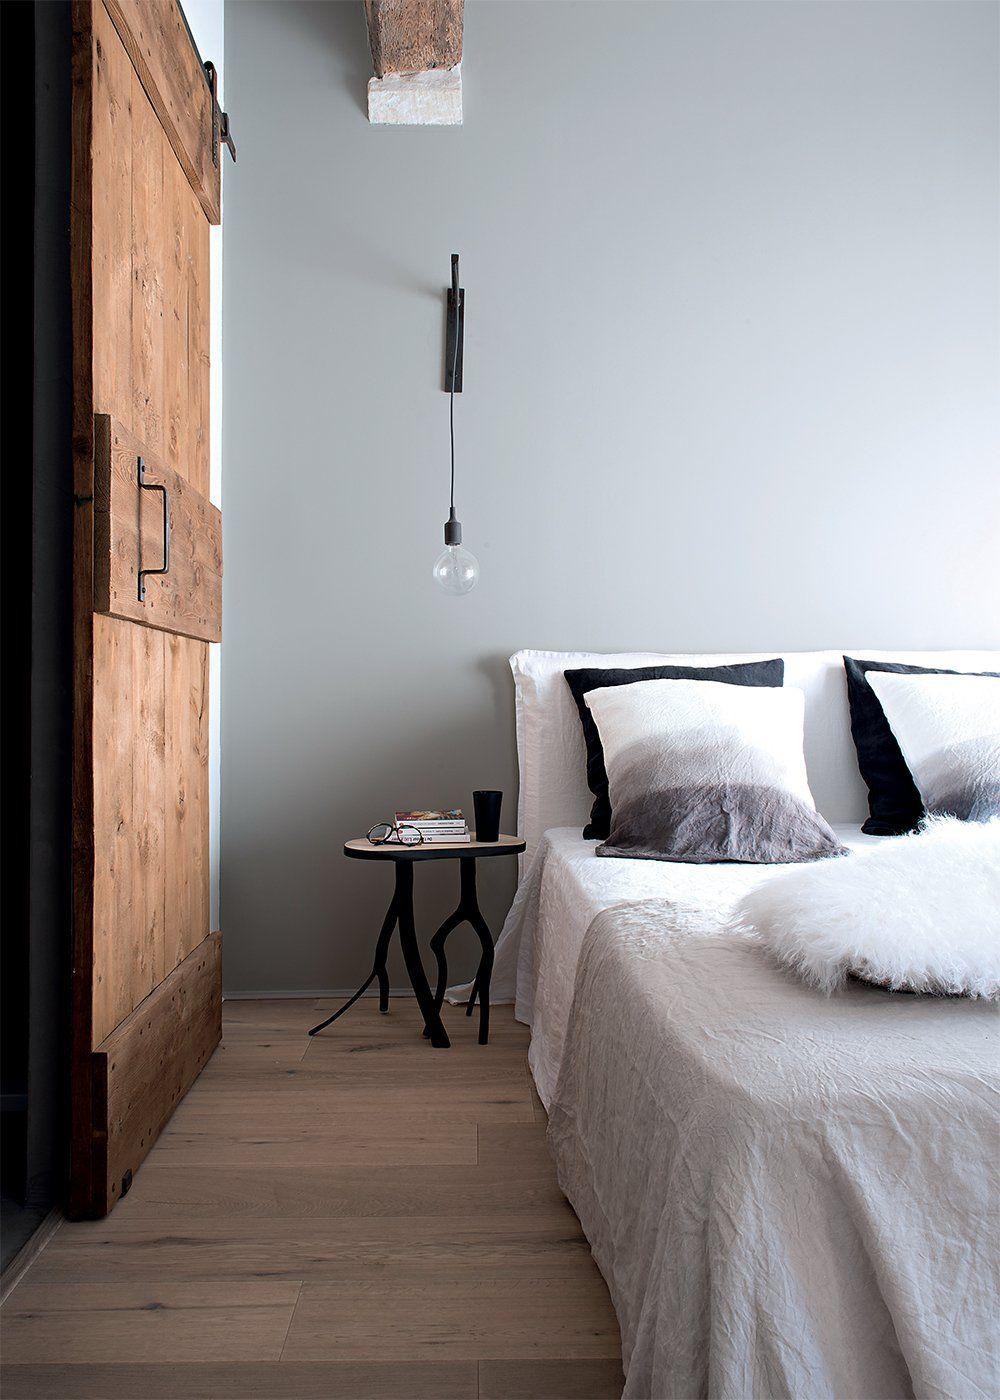 Une maison familiale l 39 allure moderne chambre moderne chambre zen chambre parentale grise - Chambre parentale grise ...